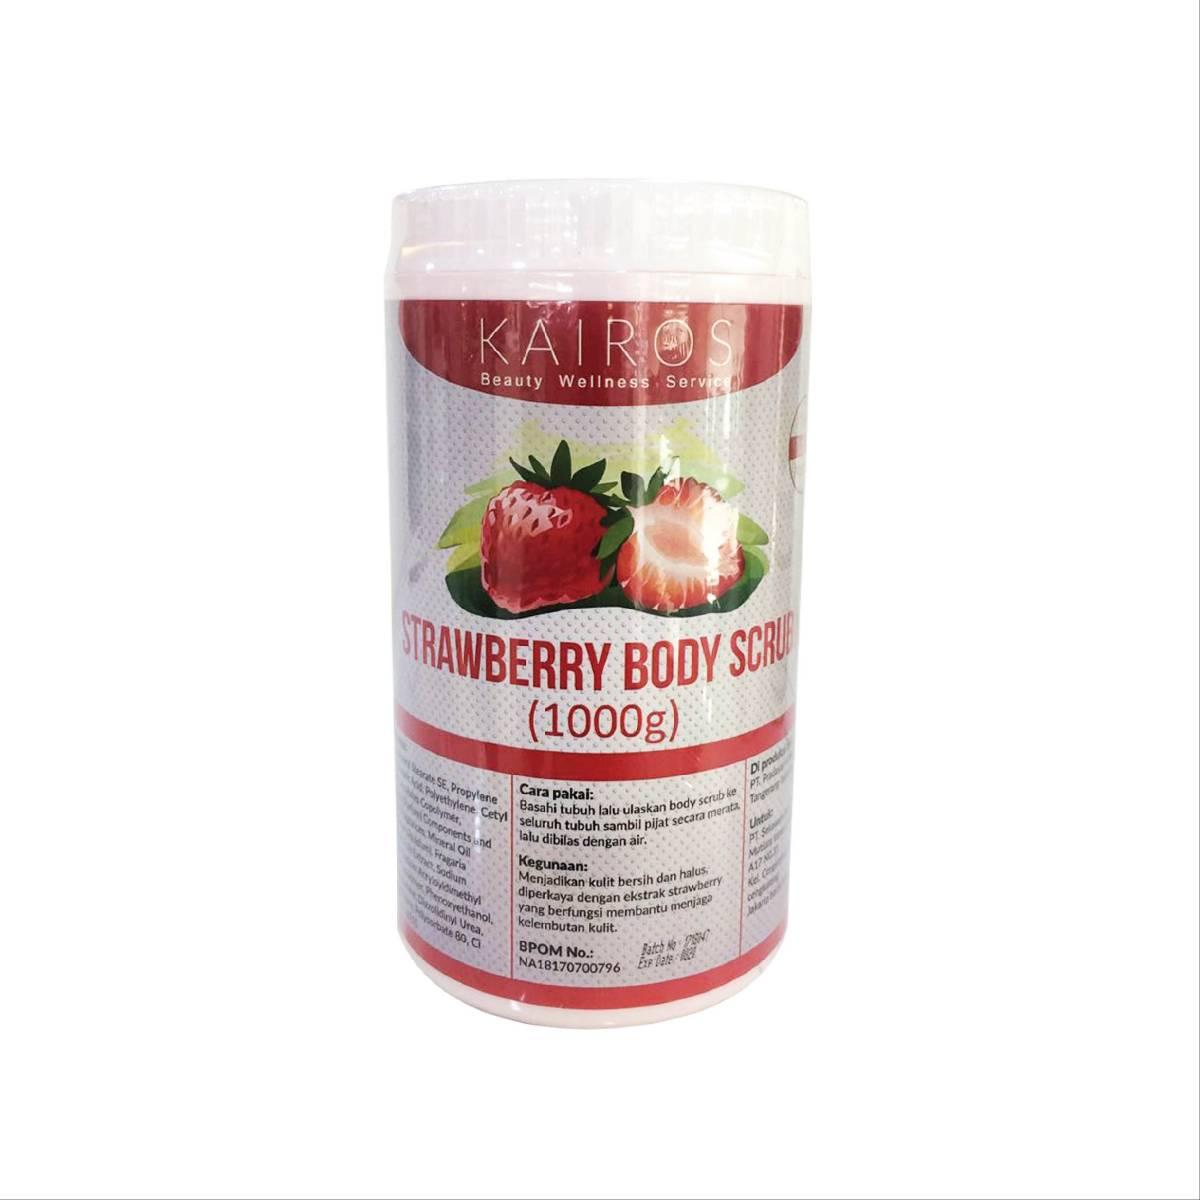 Kairos Strawberry Body Scrub - Scrub Yang Bermanfaat Untuk Membantu Menjaga Kelembutan Kul...